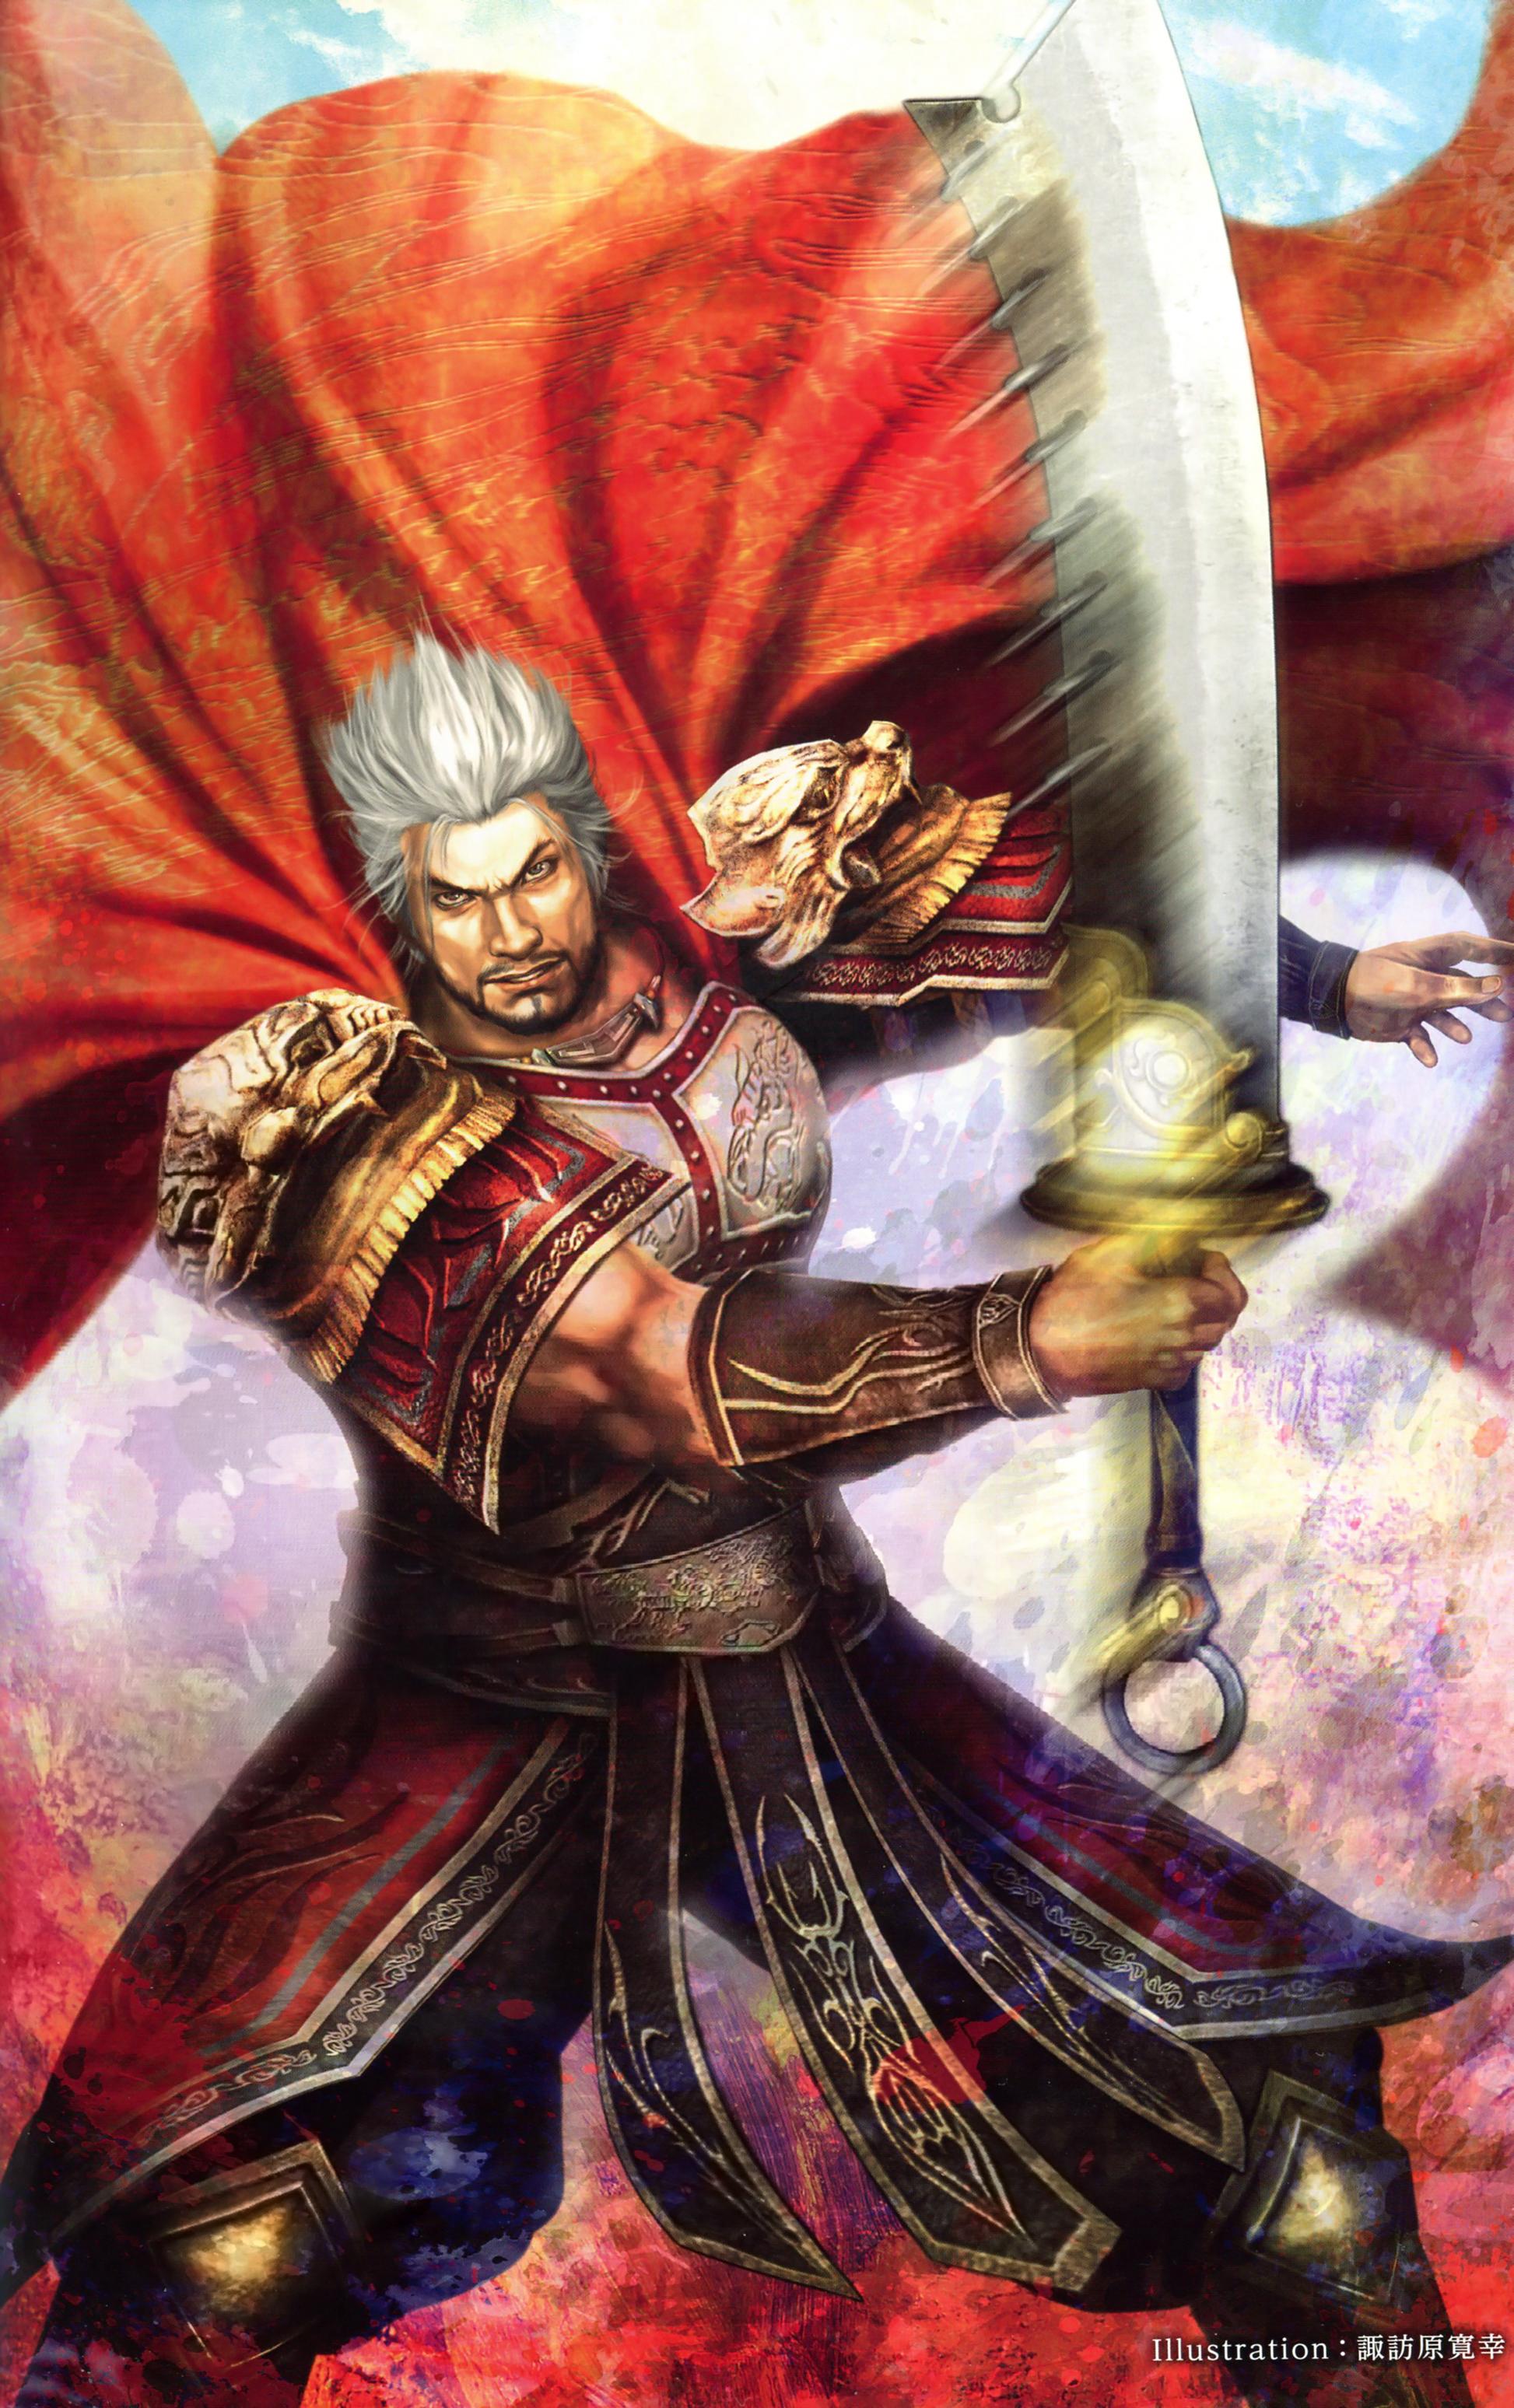 Category:Wu Characters | Koei Wiki | FANDOM powered by Wikia